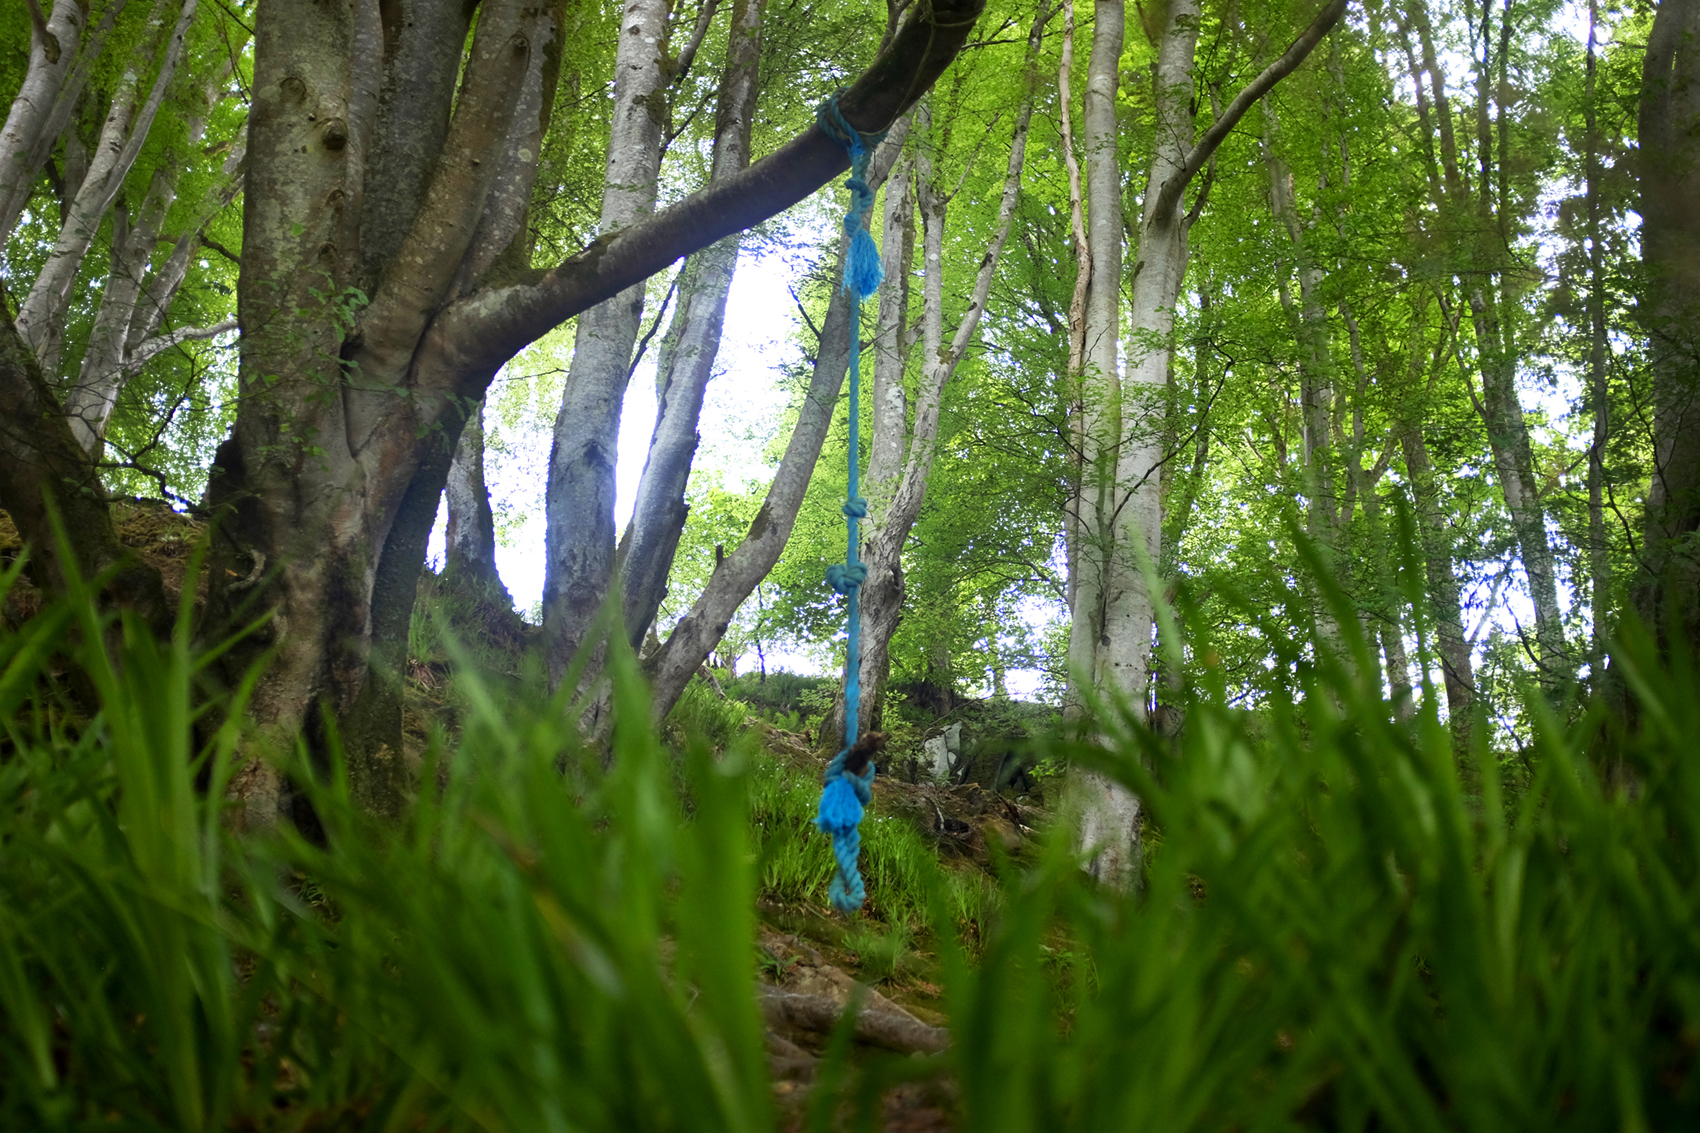 Rope swing, Tayvallich, Argyll & Bute. West Scotland.